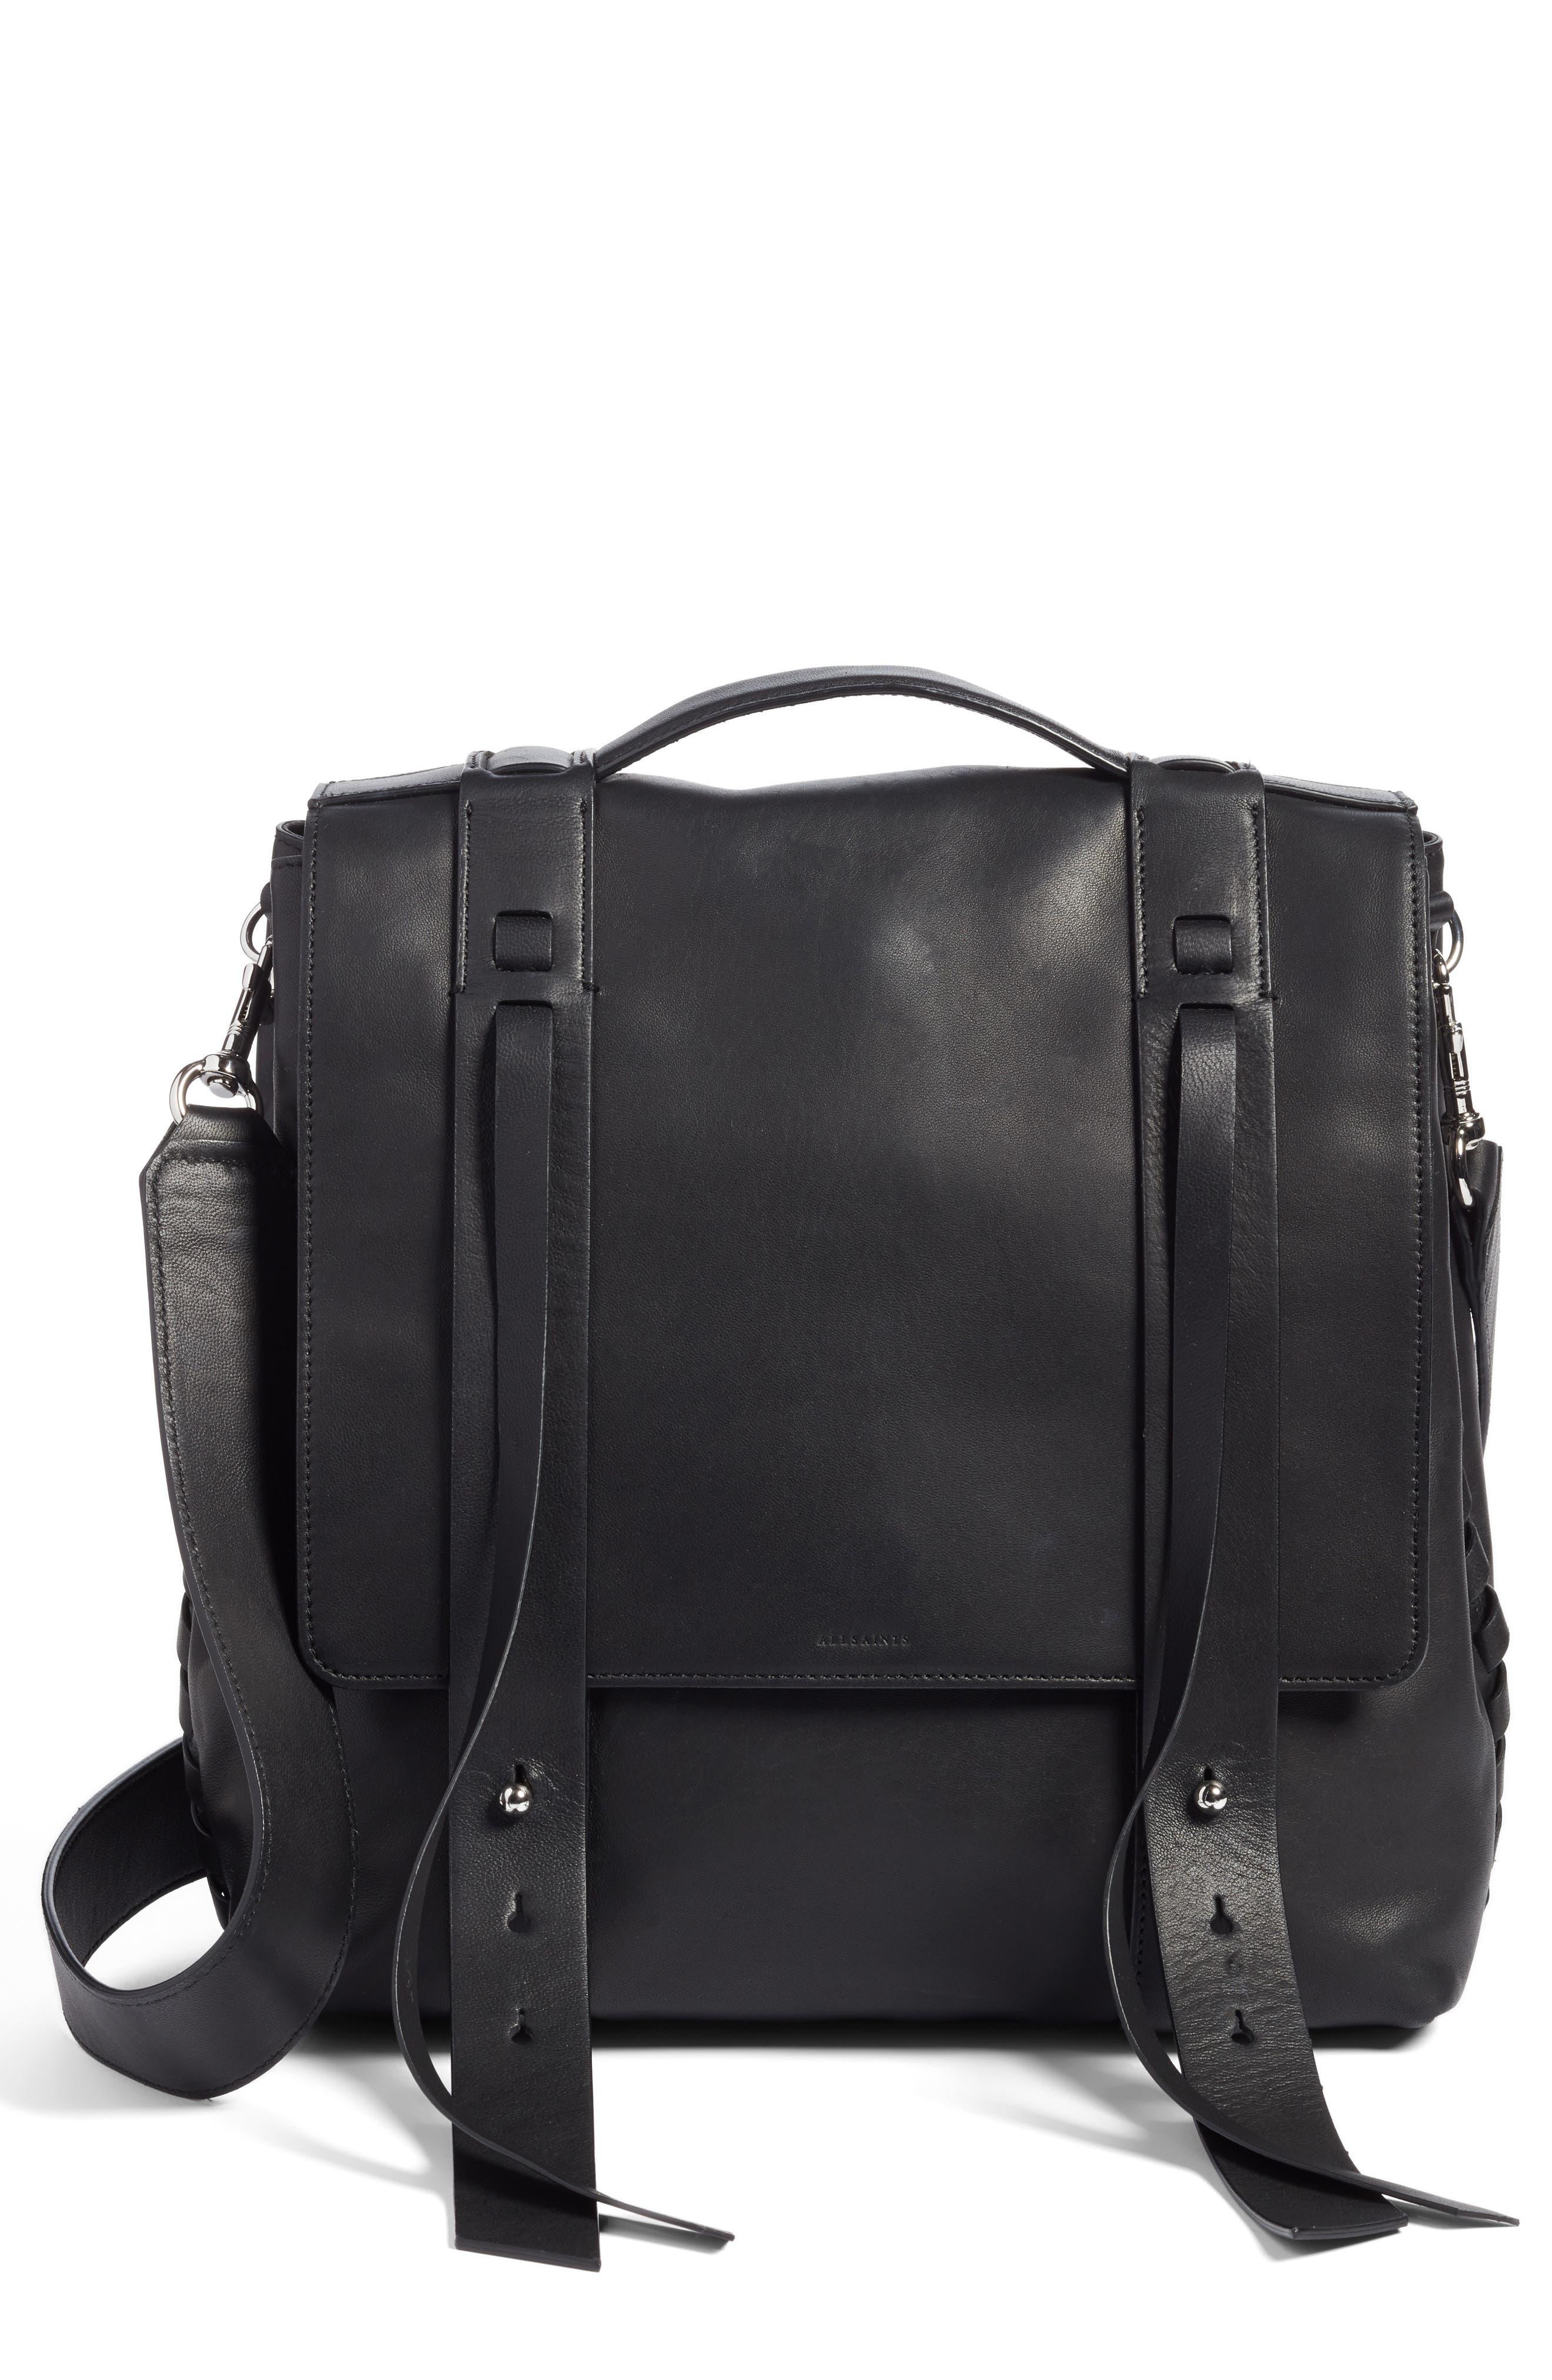 ALLSAINTS, Fin Leather Backpack, Main thumbnail 1, color, BLACK